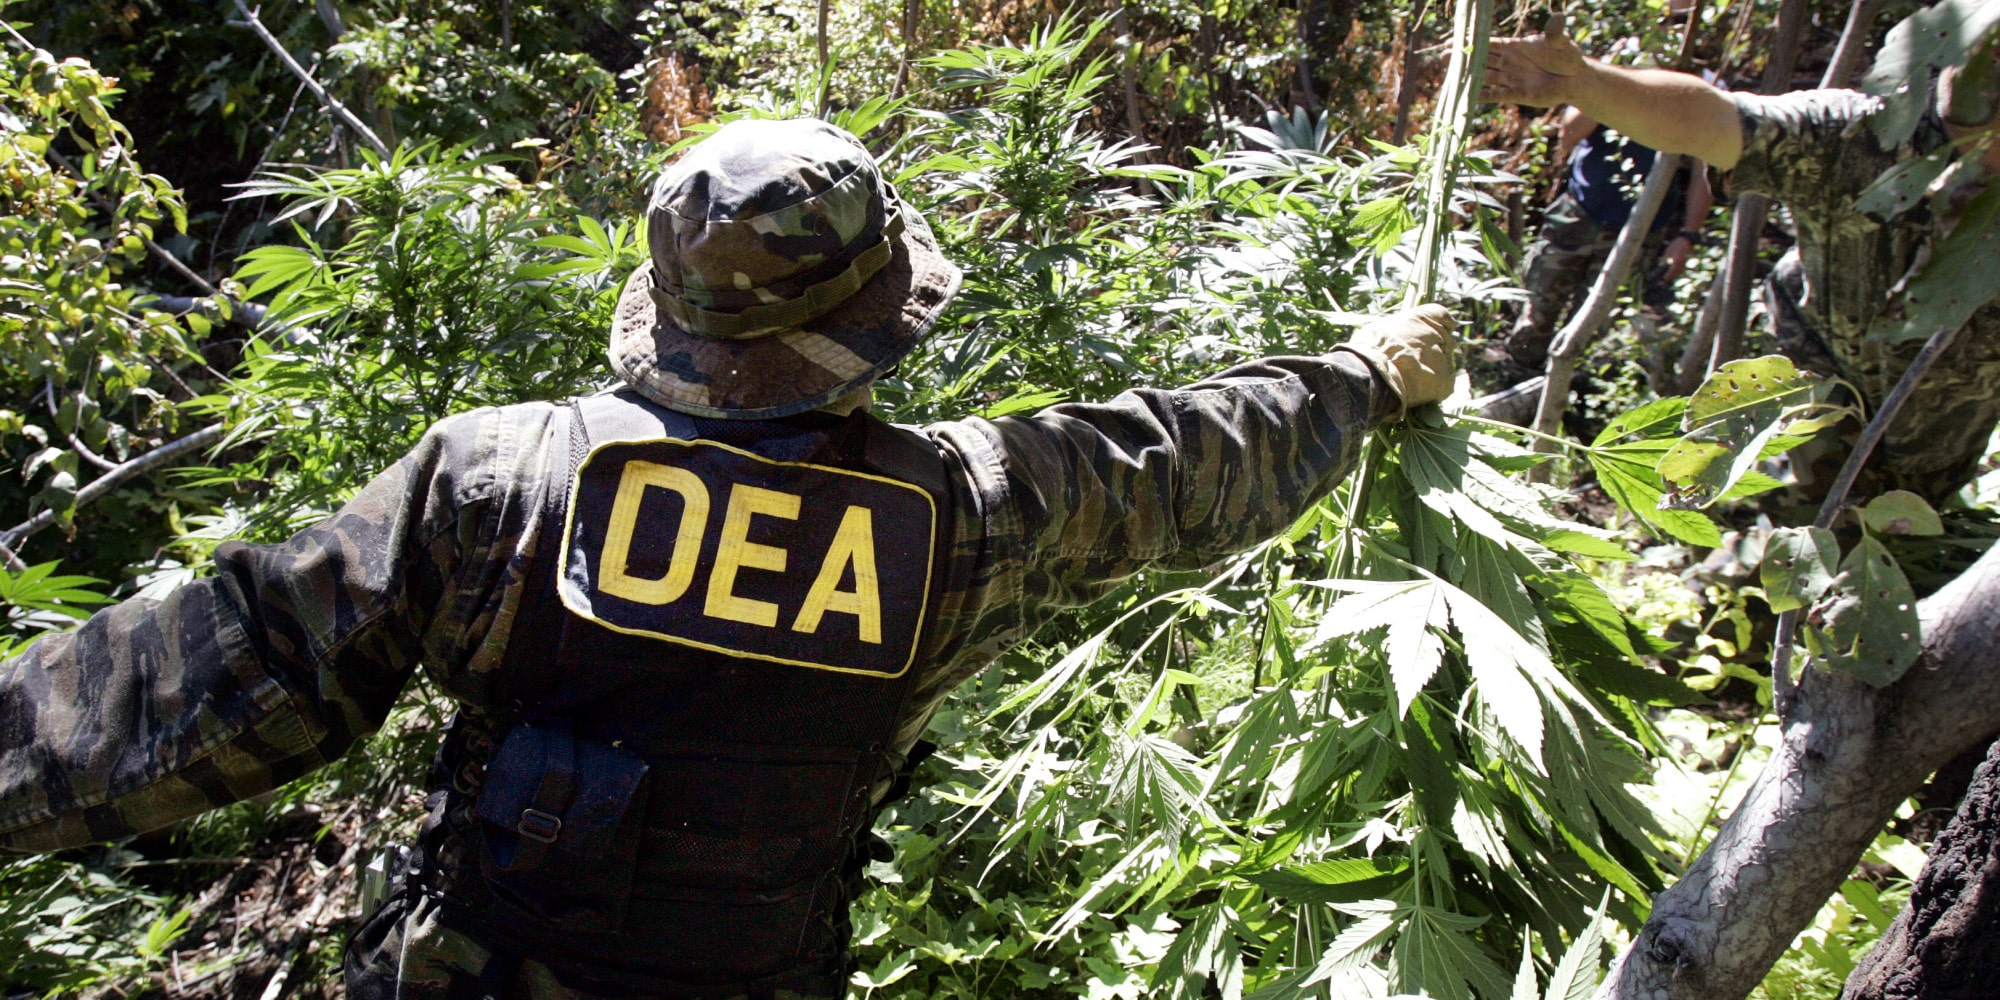 Nación Cannabis | Senado de México prioriza legalización de marihuana y amnistía